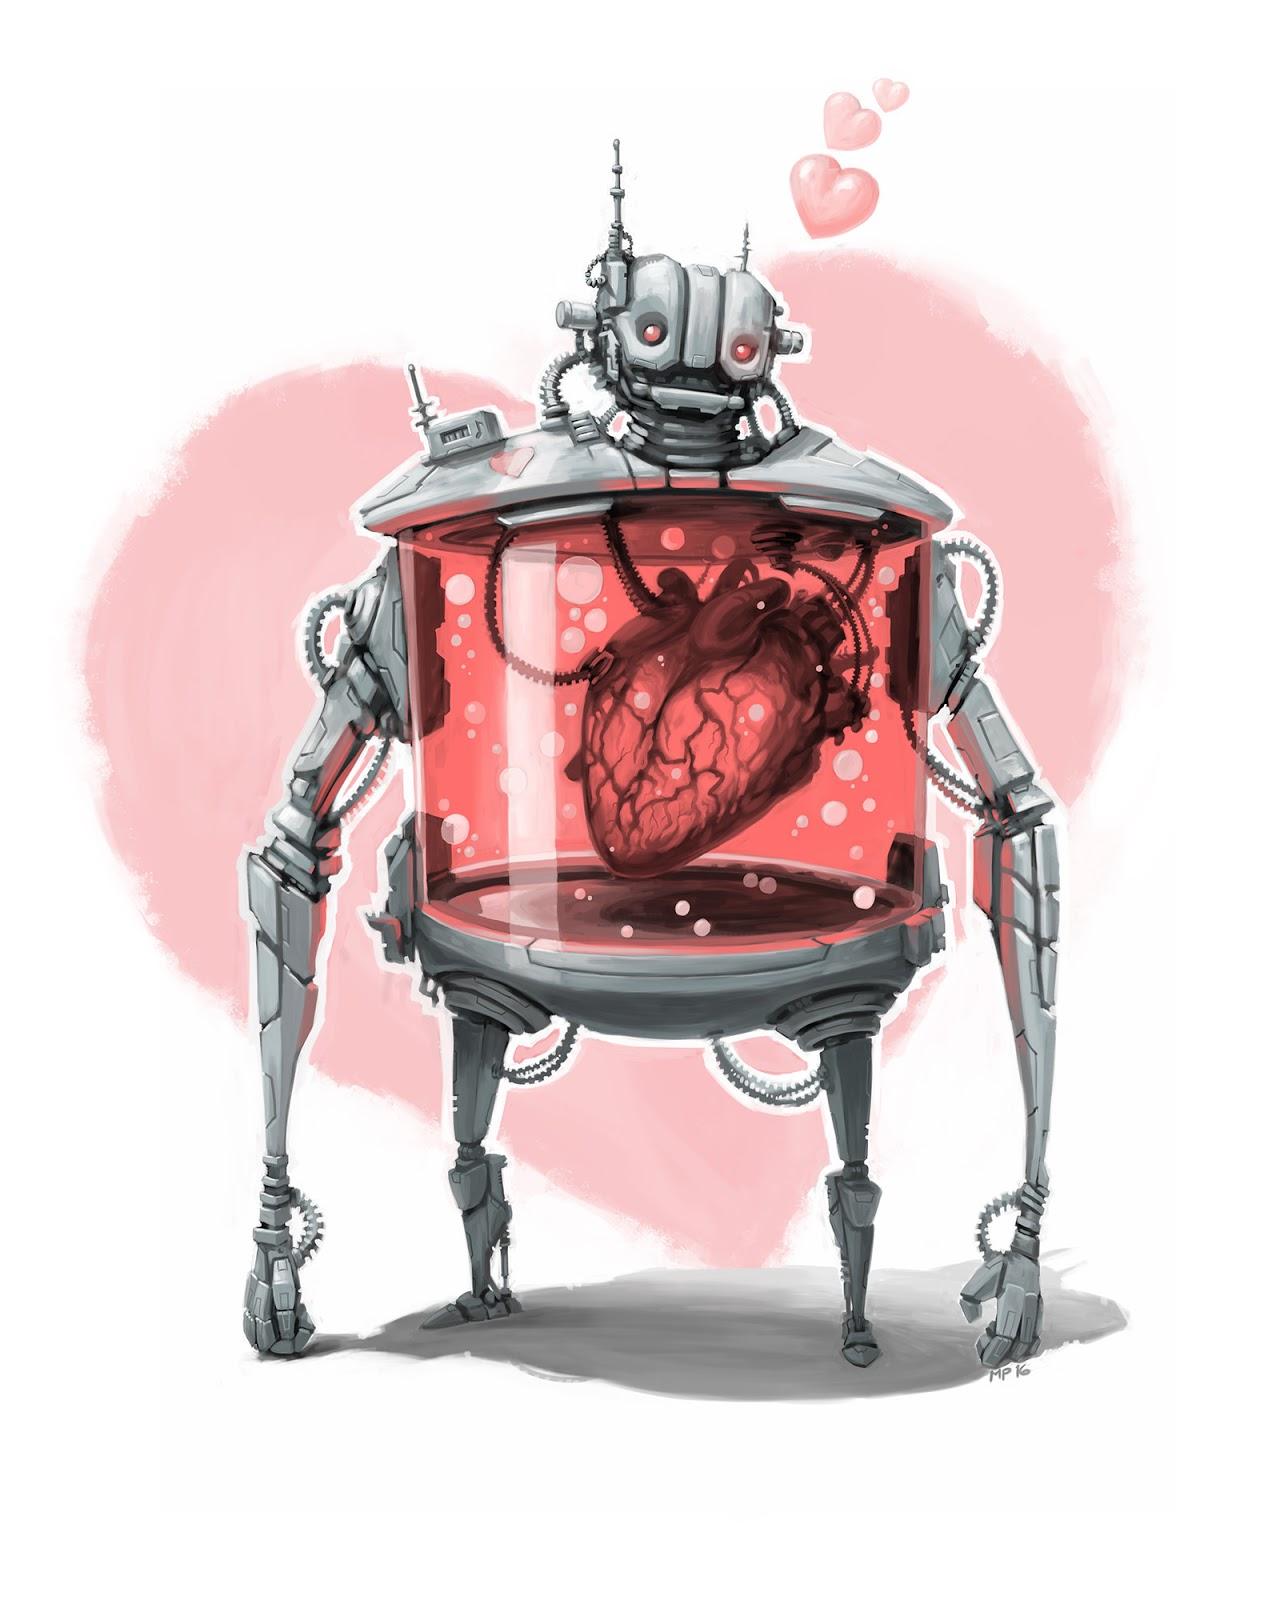 Creative Artsy Valentines Day Wallpaper Inspiration, valentines day wallpaper robot, valentines day wallpaper art, valentines day wallpaper love, valentines day wallpaper scifi